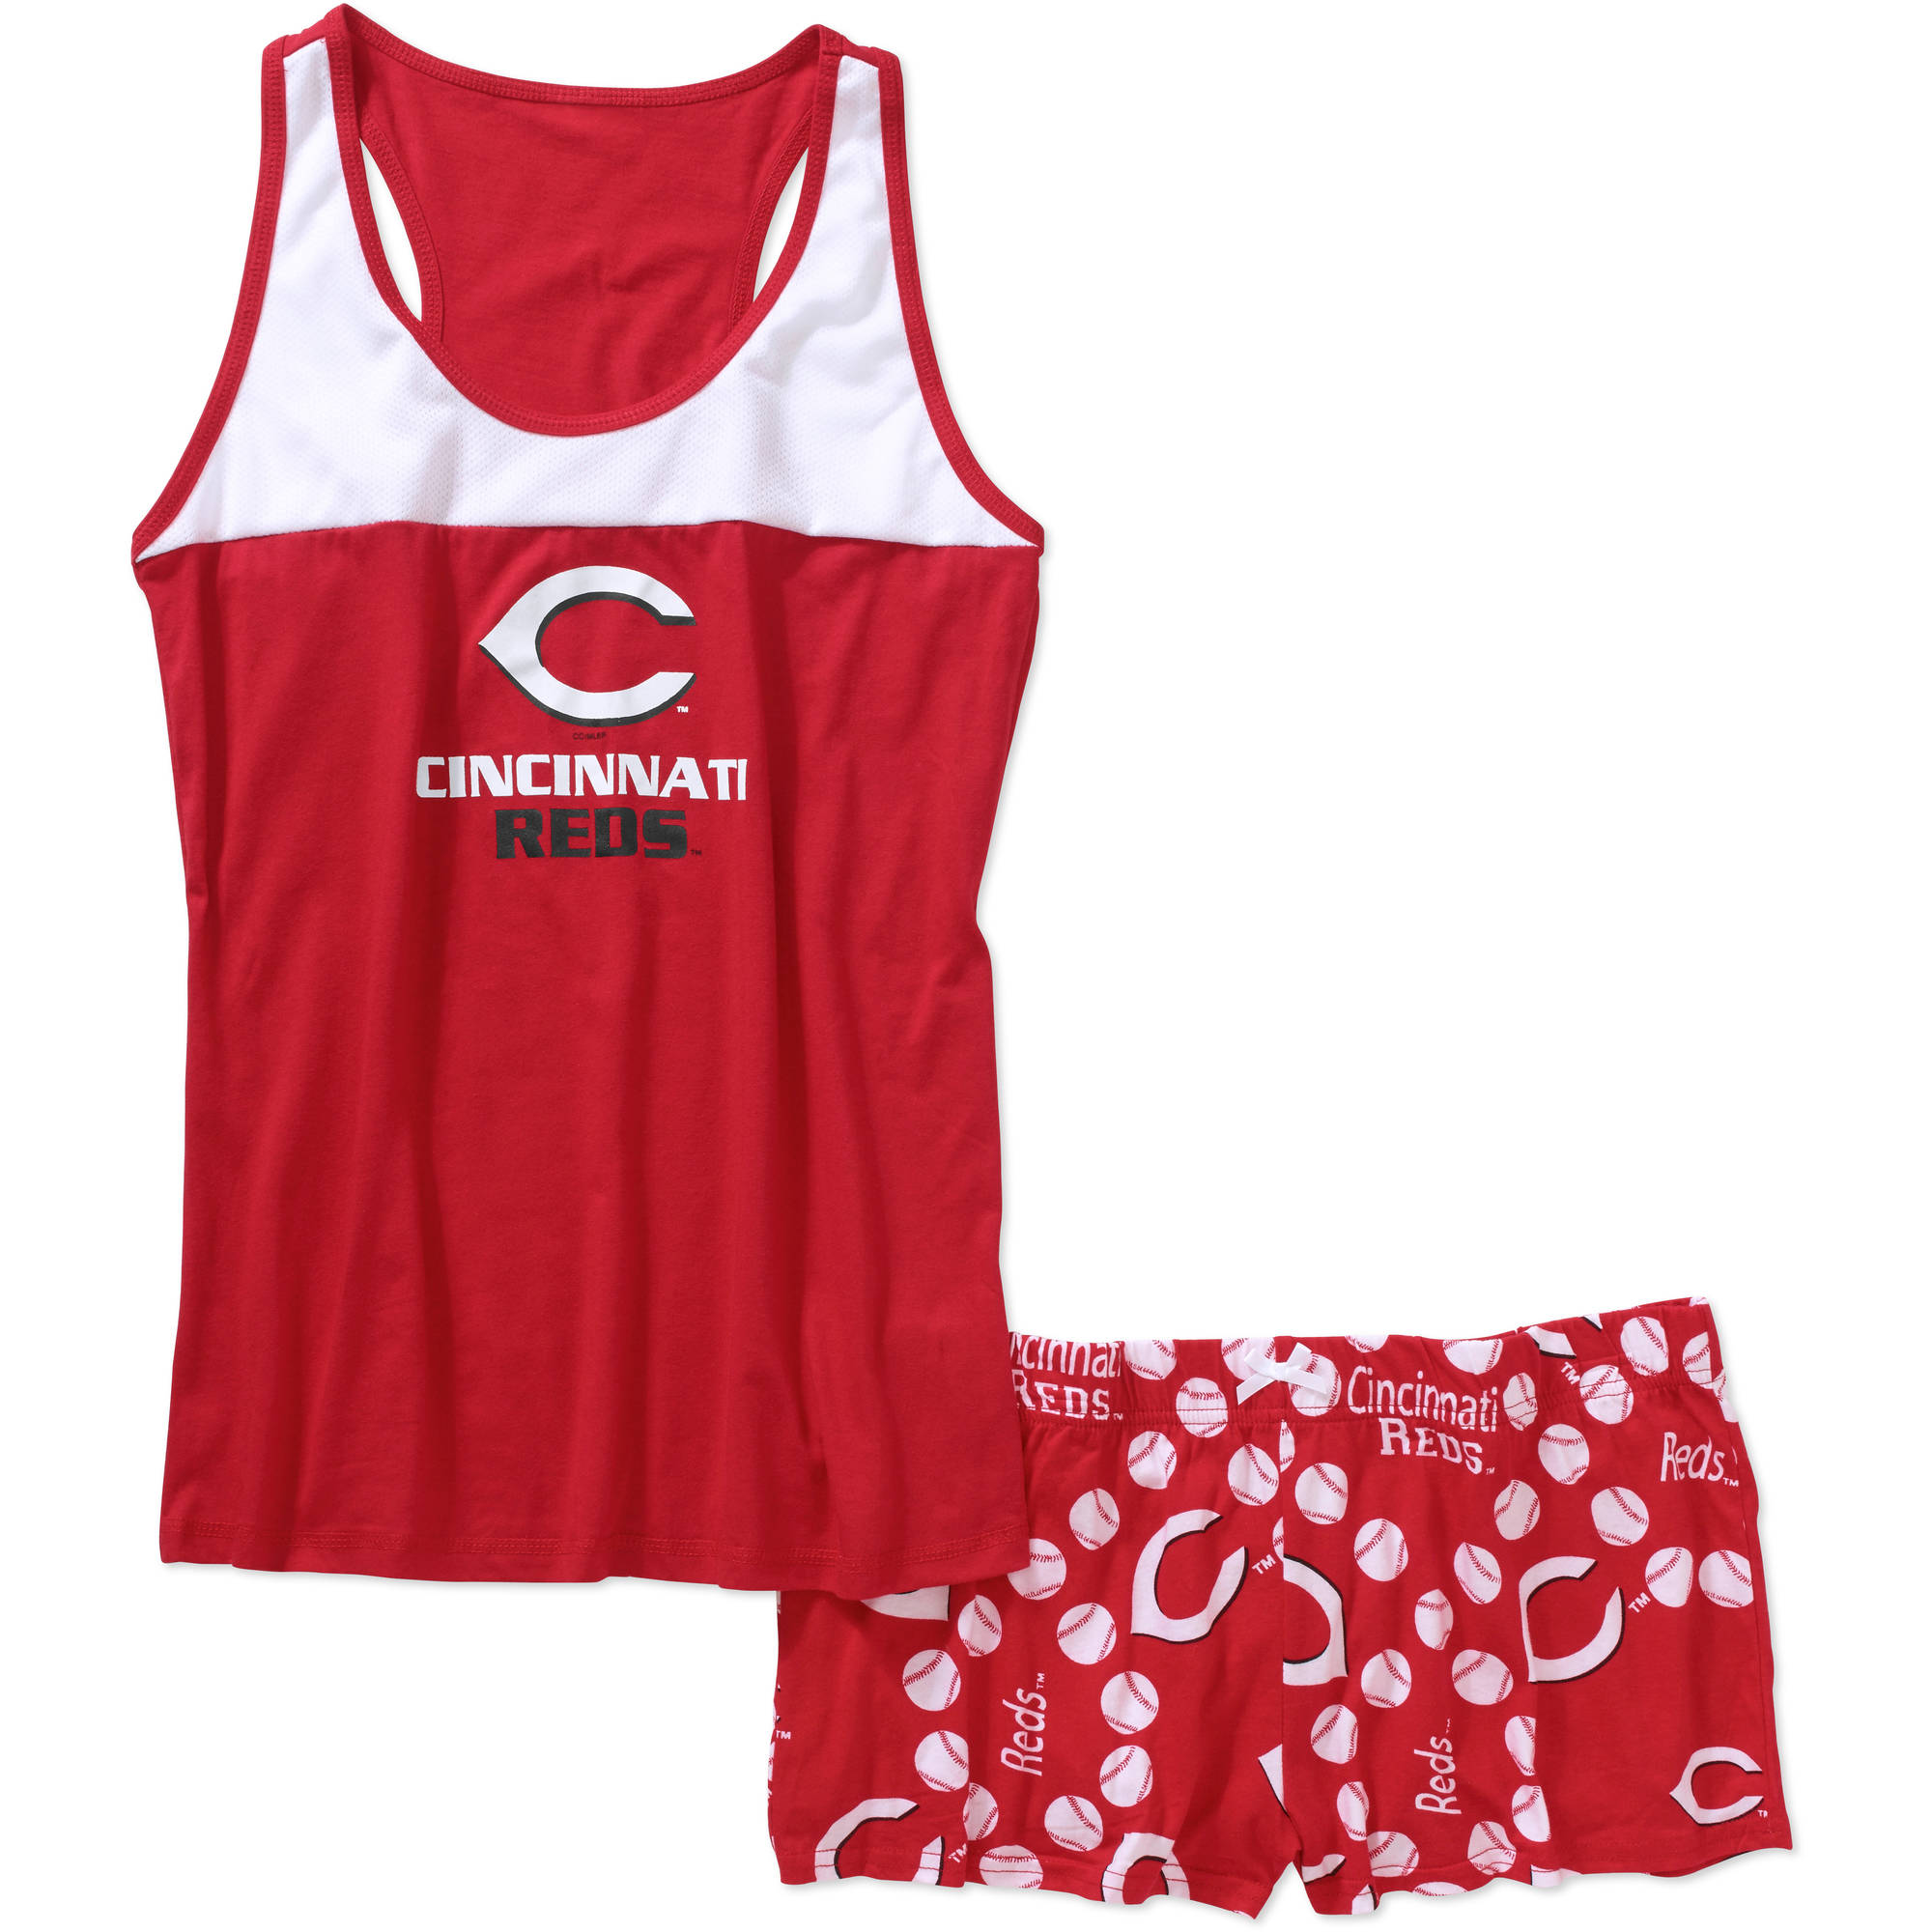 MLB Women's Cincinnati Reds Tank Top and Shorts Set